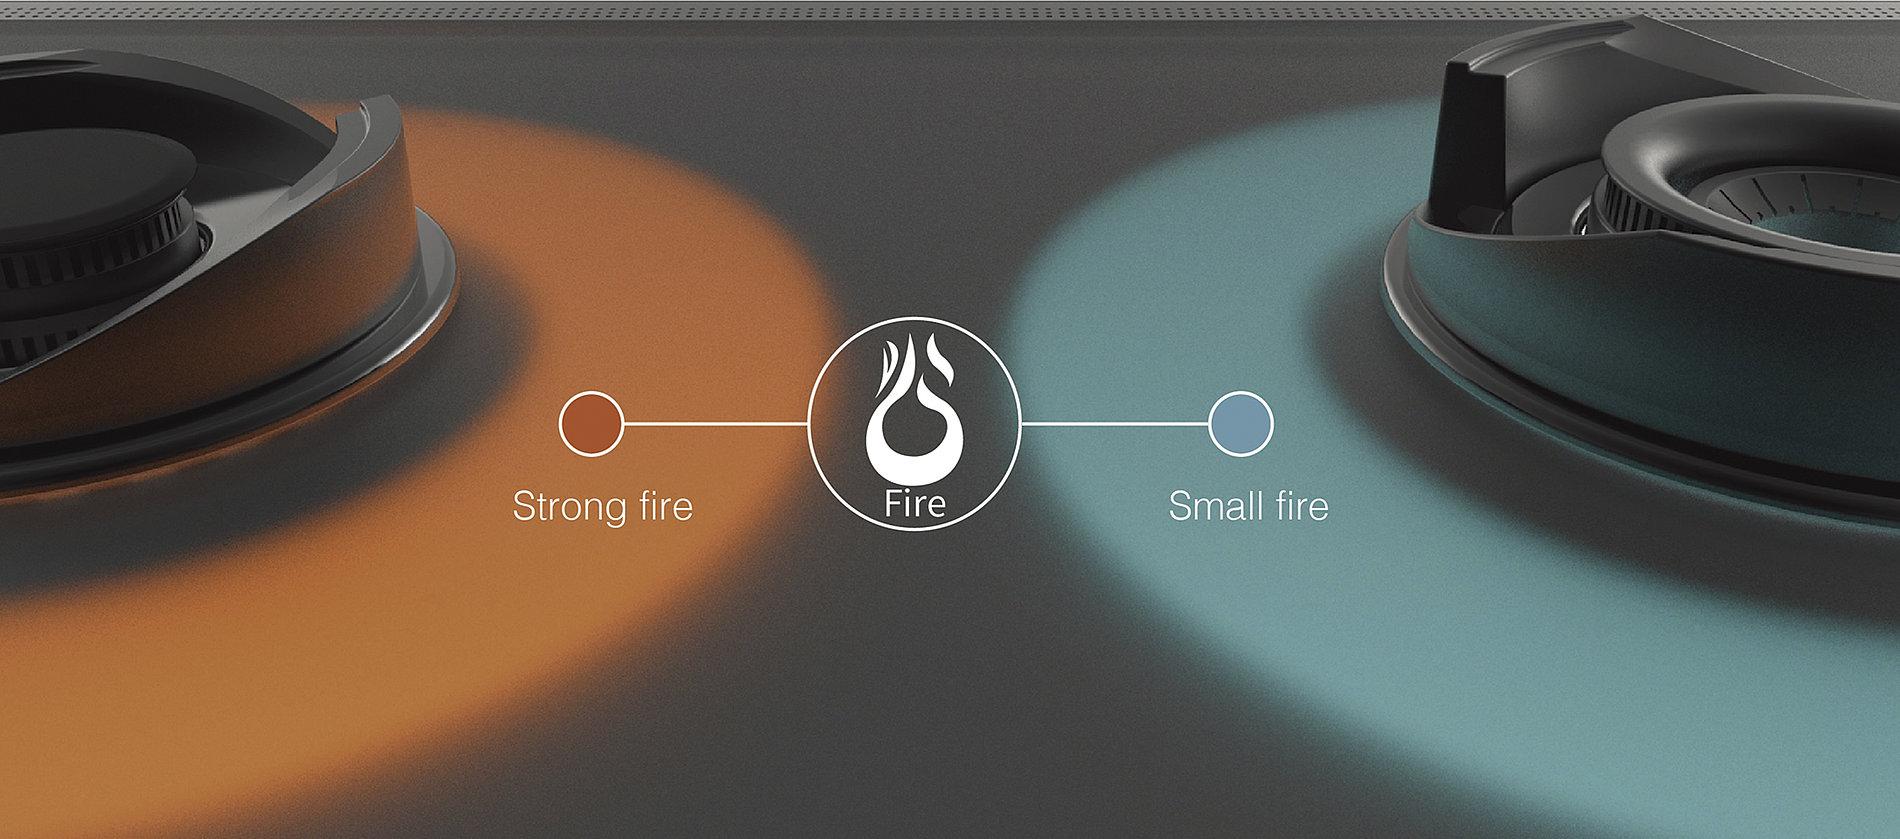 Shine & Airflow Stove | Red Dot Design Award